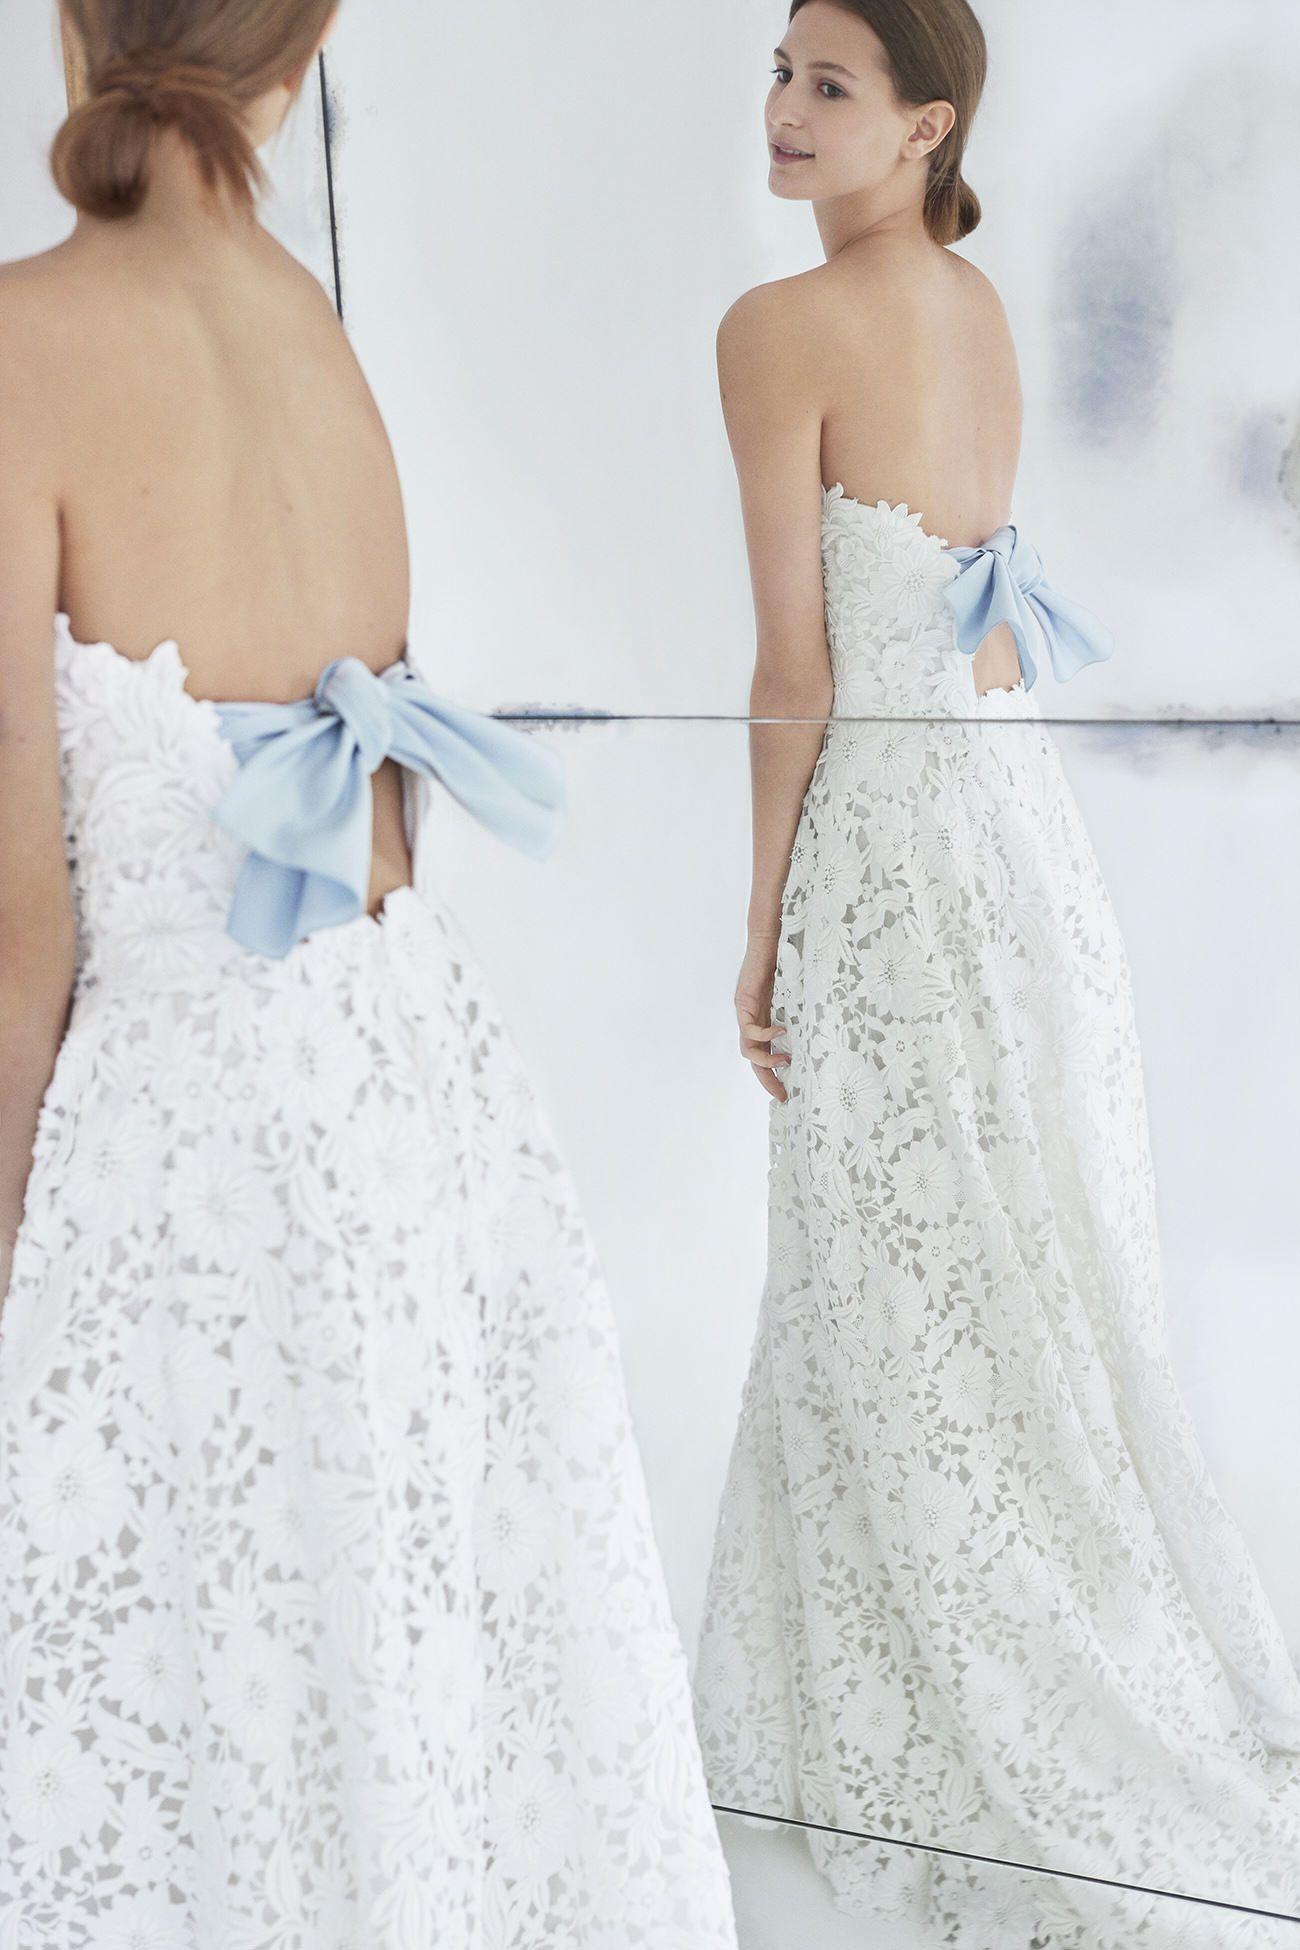 6f733515d4 LOOK 6 - GERTRUDE by Carolina Herrera Style: 35803FBE | Bridal ...